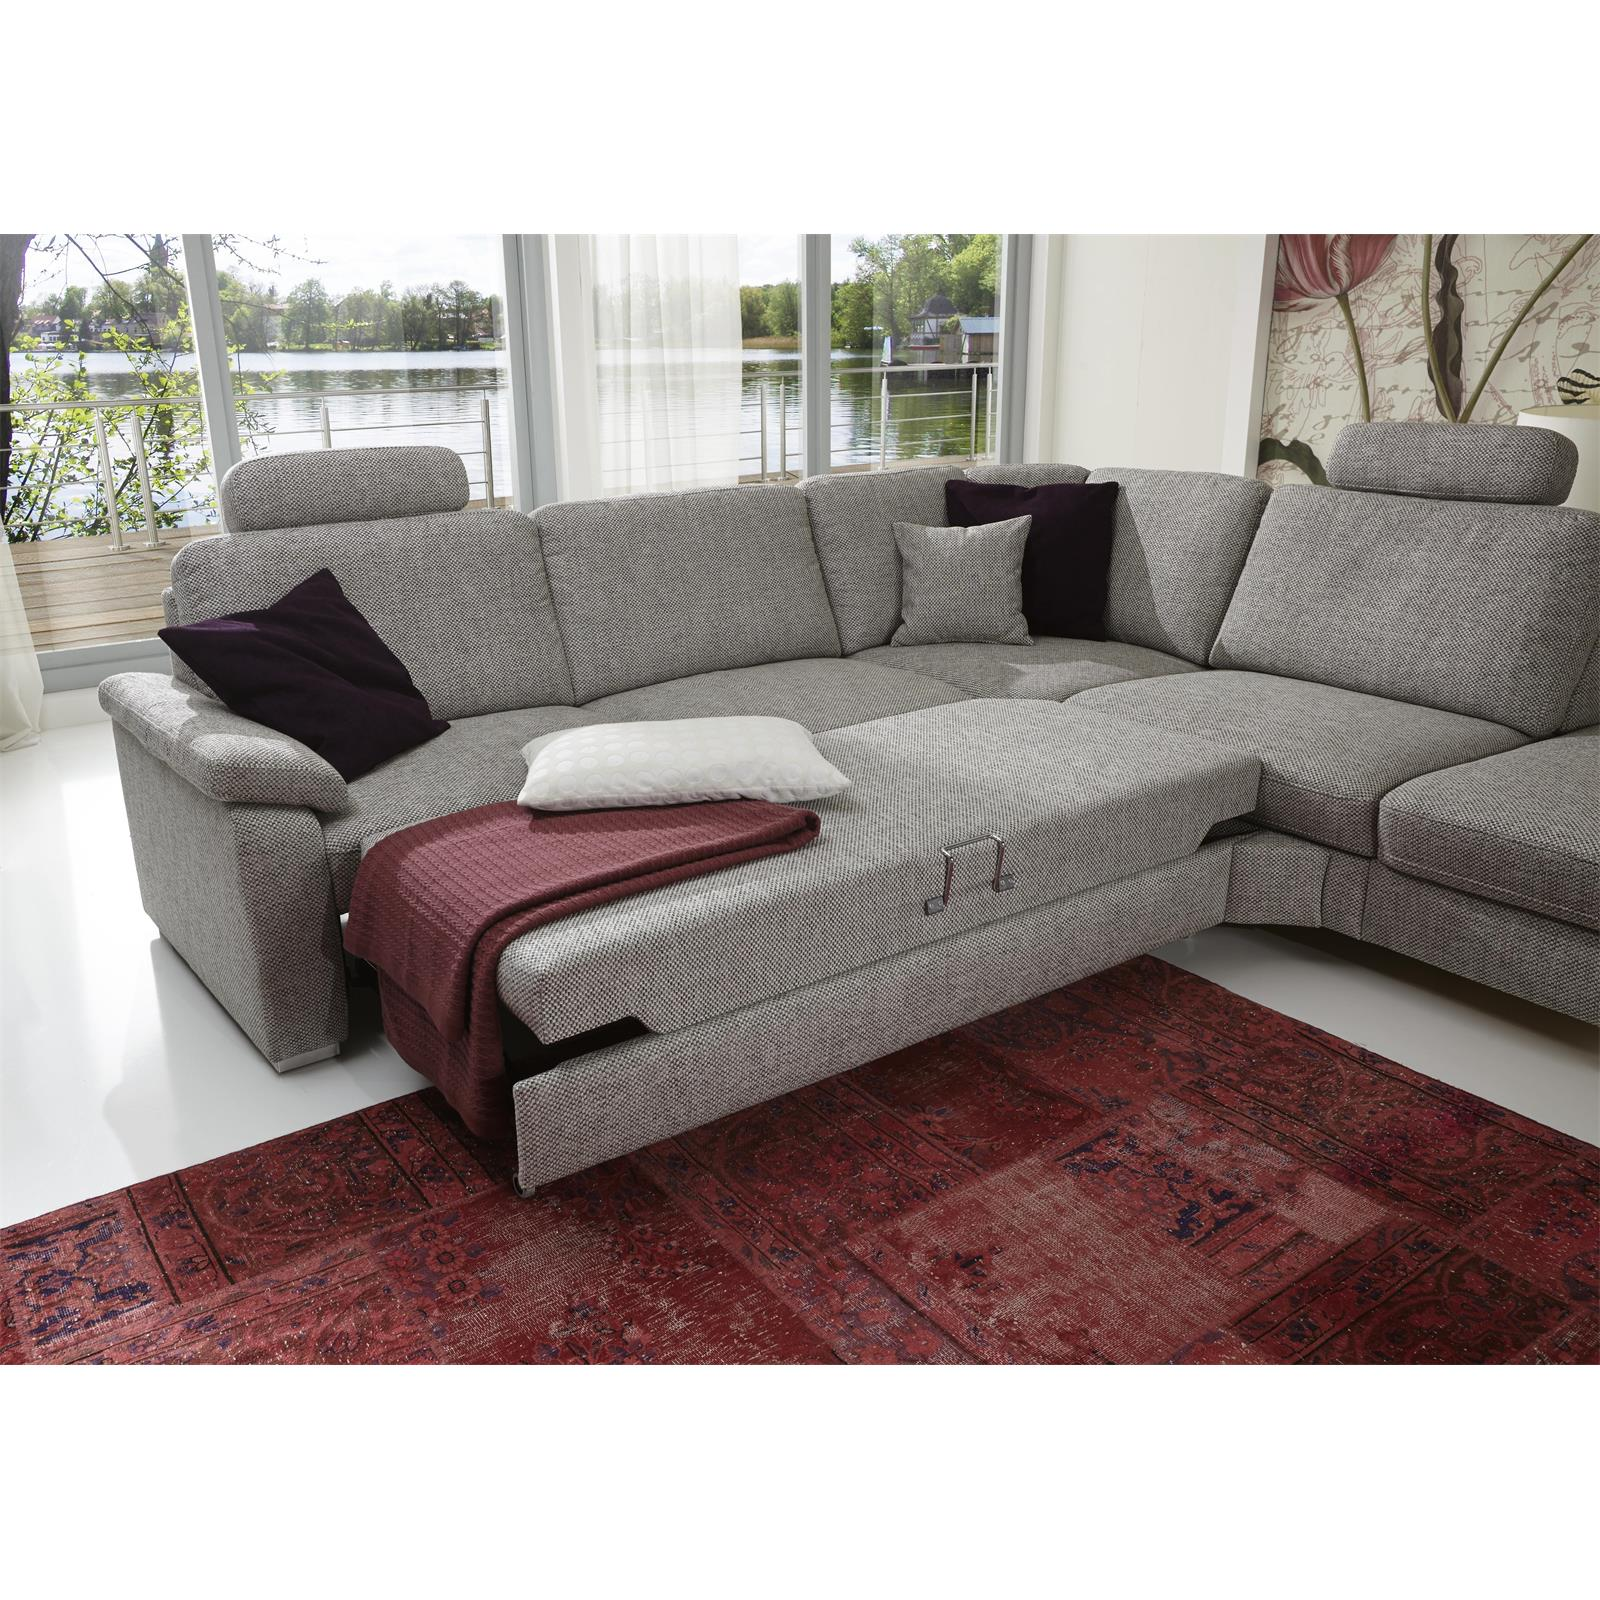 ecksofa estrala ecksofas mit schlaffunktion ecksofa paola. Black Bedroom Furniture Sets. Home Design Ideas